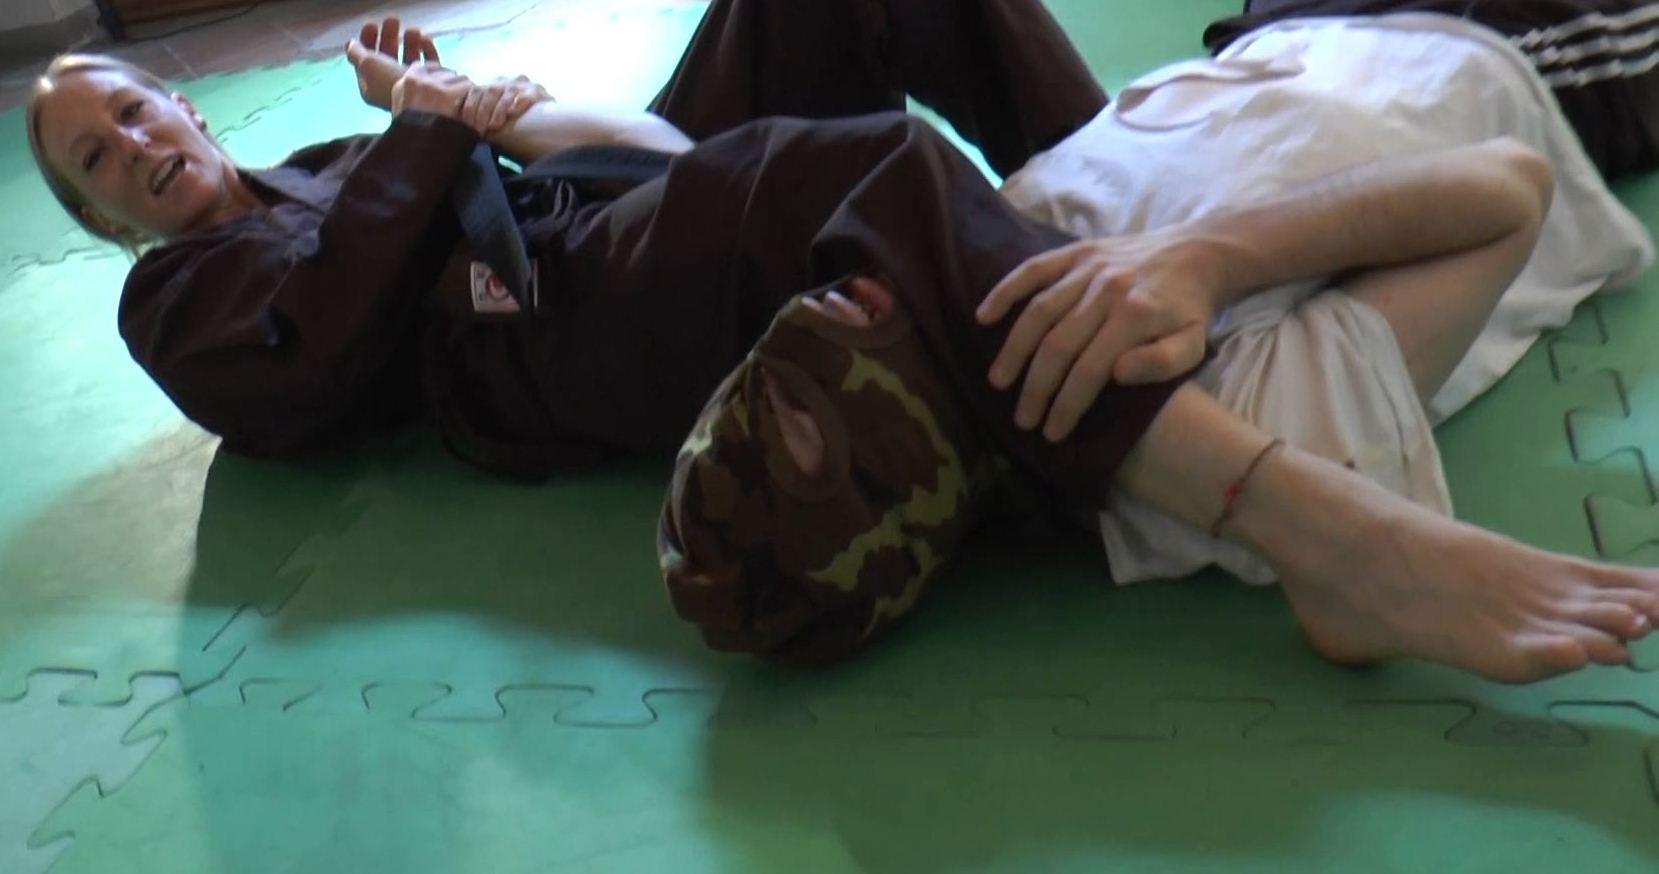 Chiara In Scene: Chiara sadistic and cruel karate killer Part 2 - MARTIAL FETISH / CLIPS4SALE - FULL HD/1080p/MP4